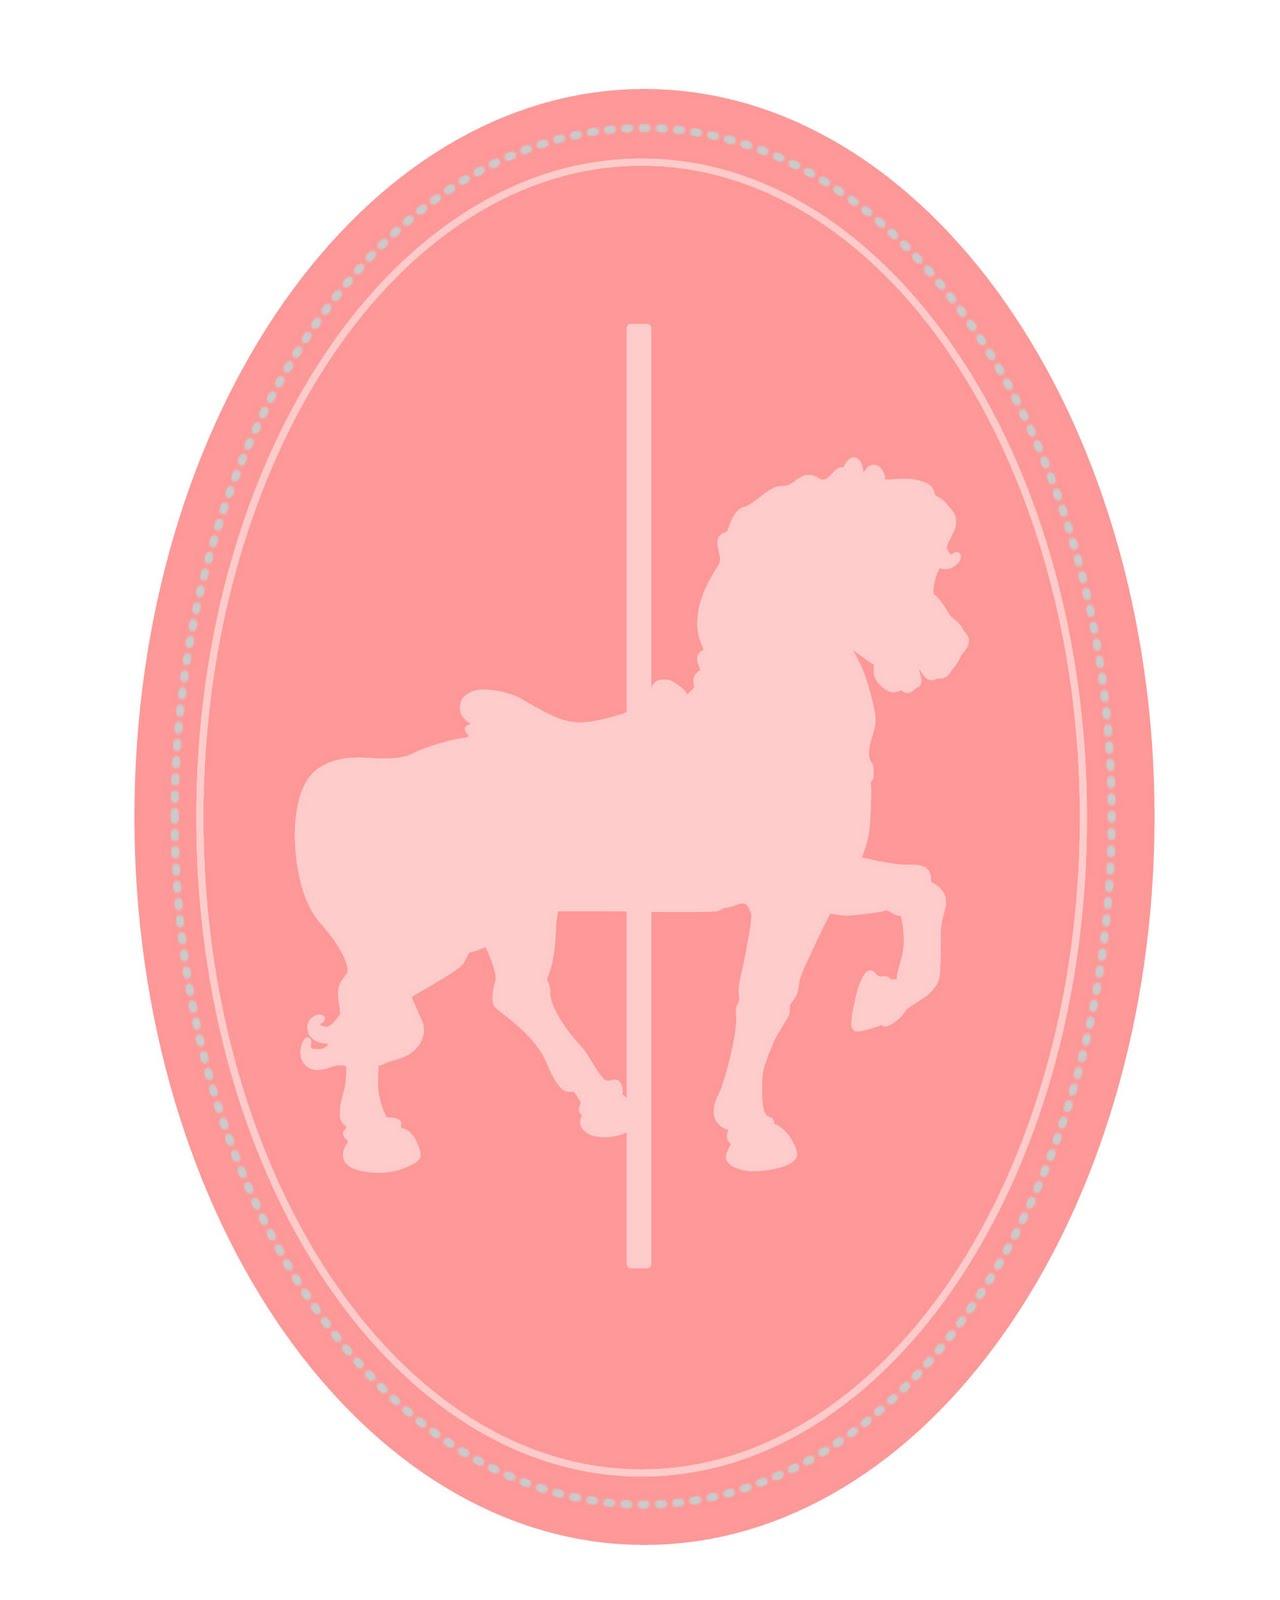 Carousel clipart victorian Silhouette Horse Silhouette alternatives Missie